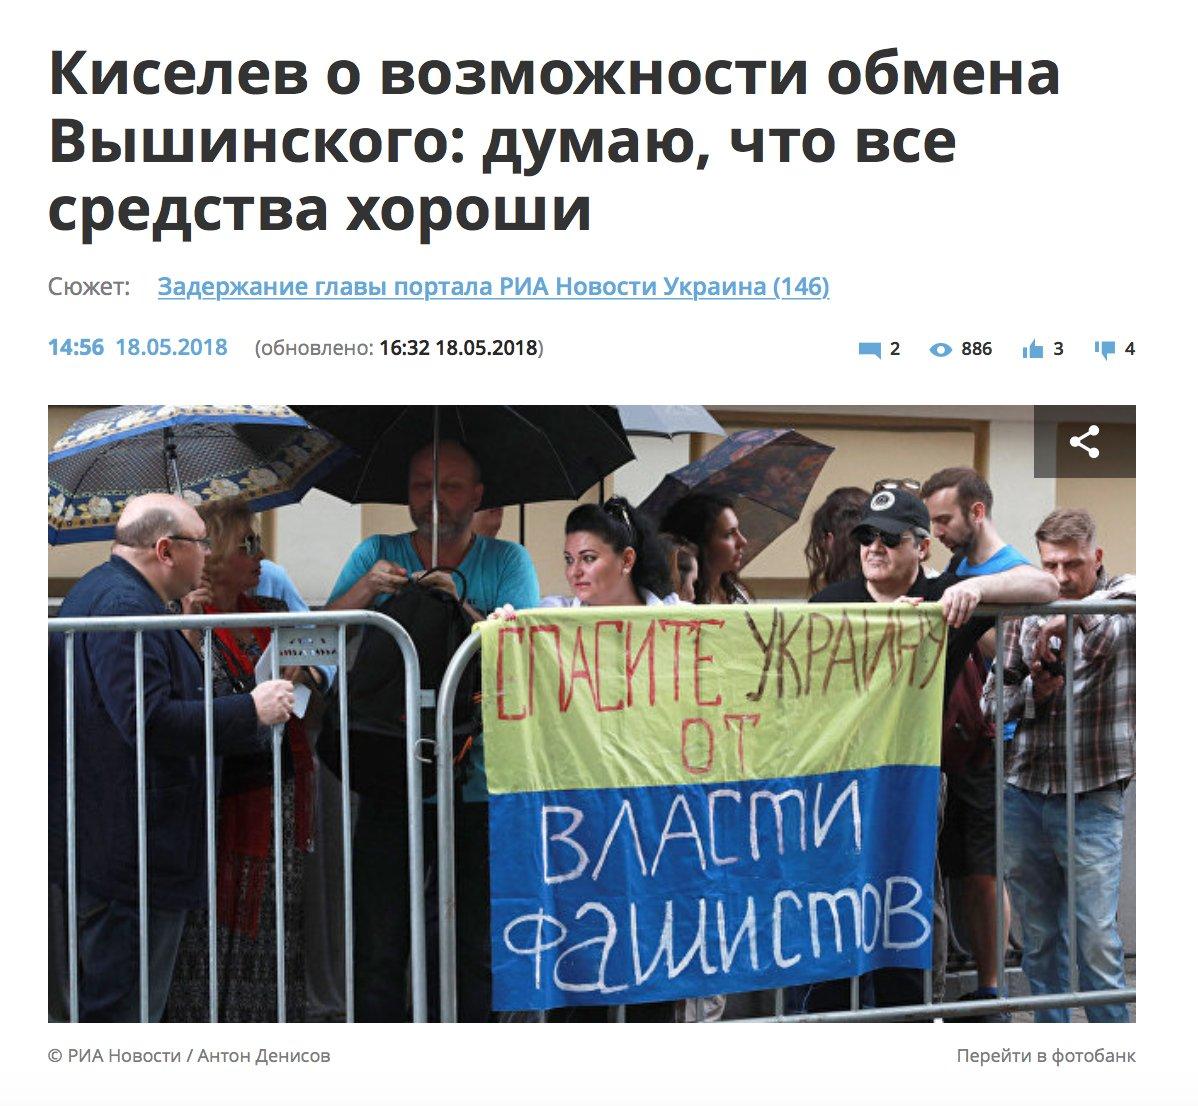 Ukraine News. Saturday 18 May. [Ukrainian sources] Ddidv8YV4AAGR-d